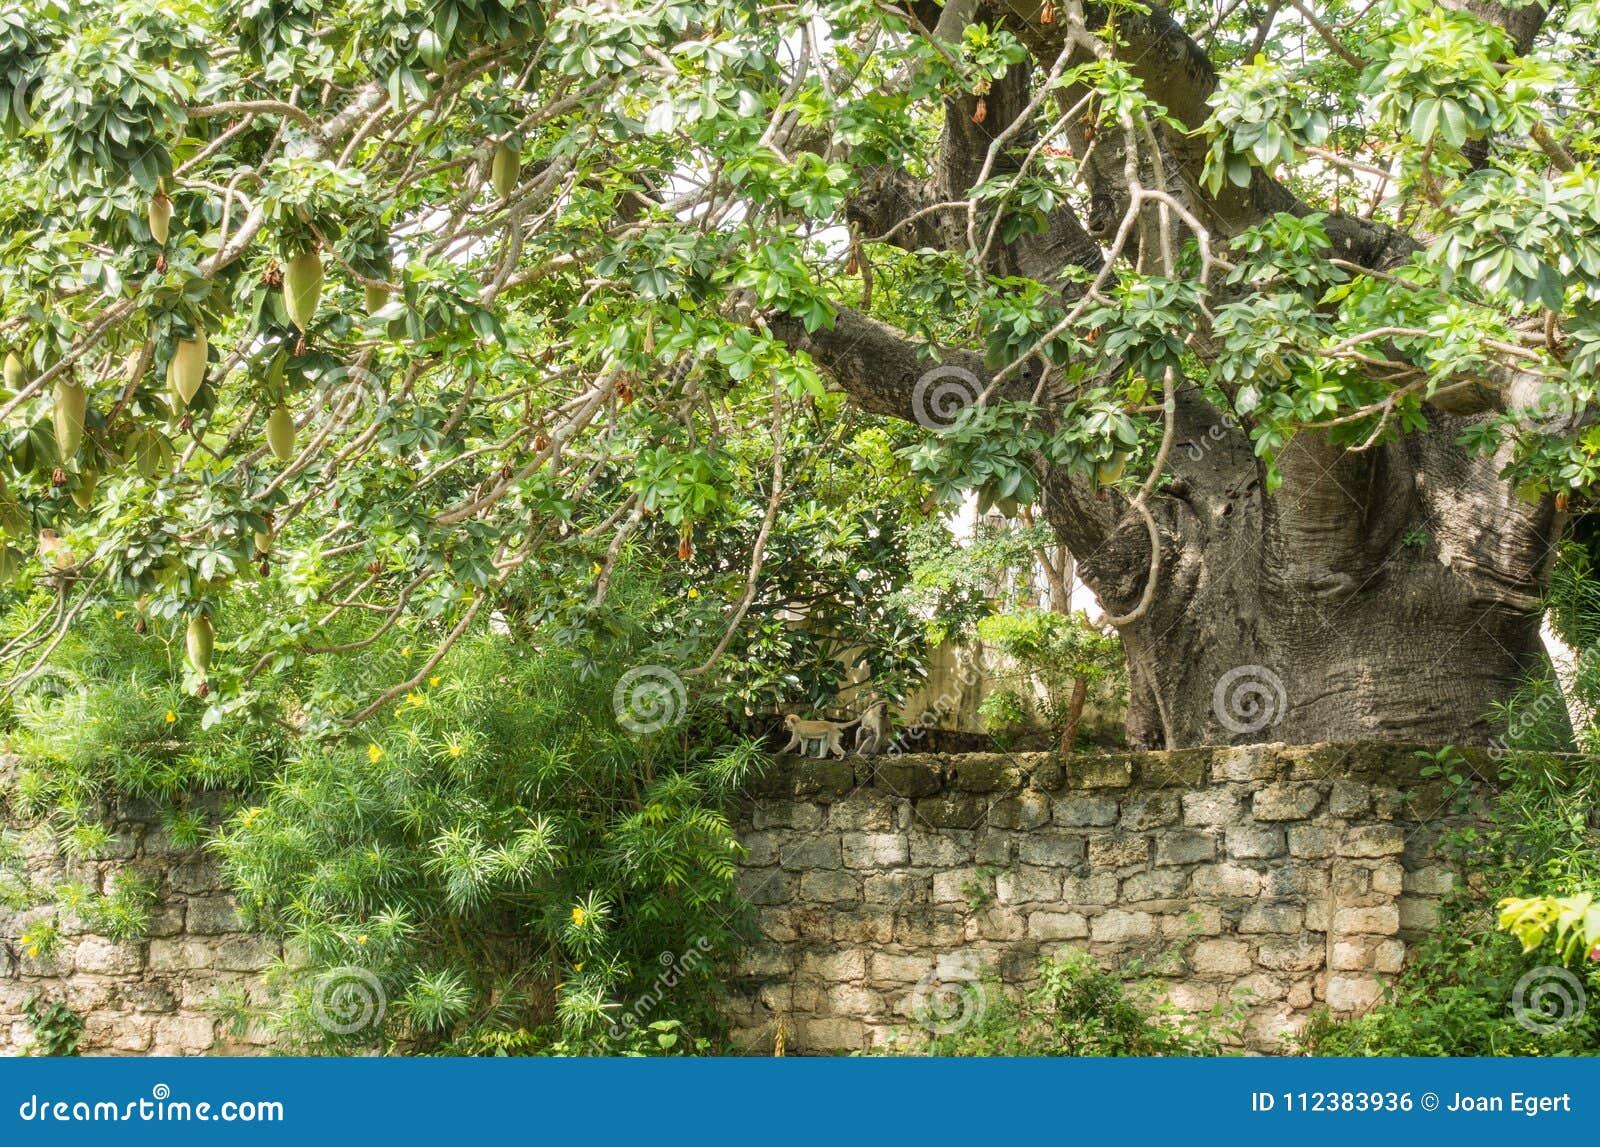 Huge Baobab tree with Vervet monkey family